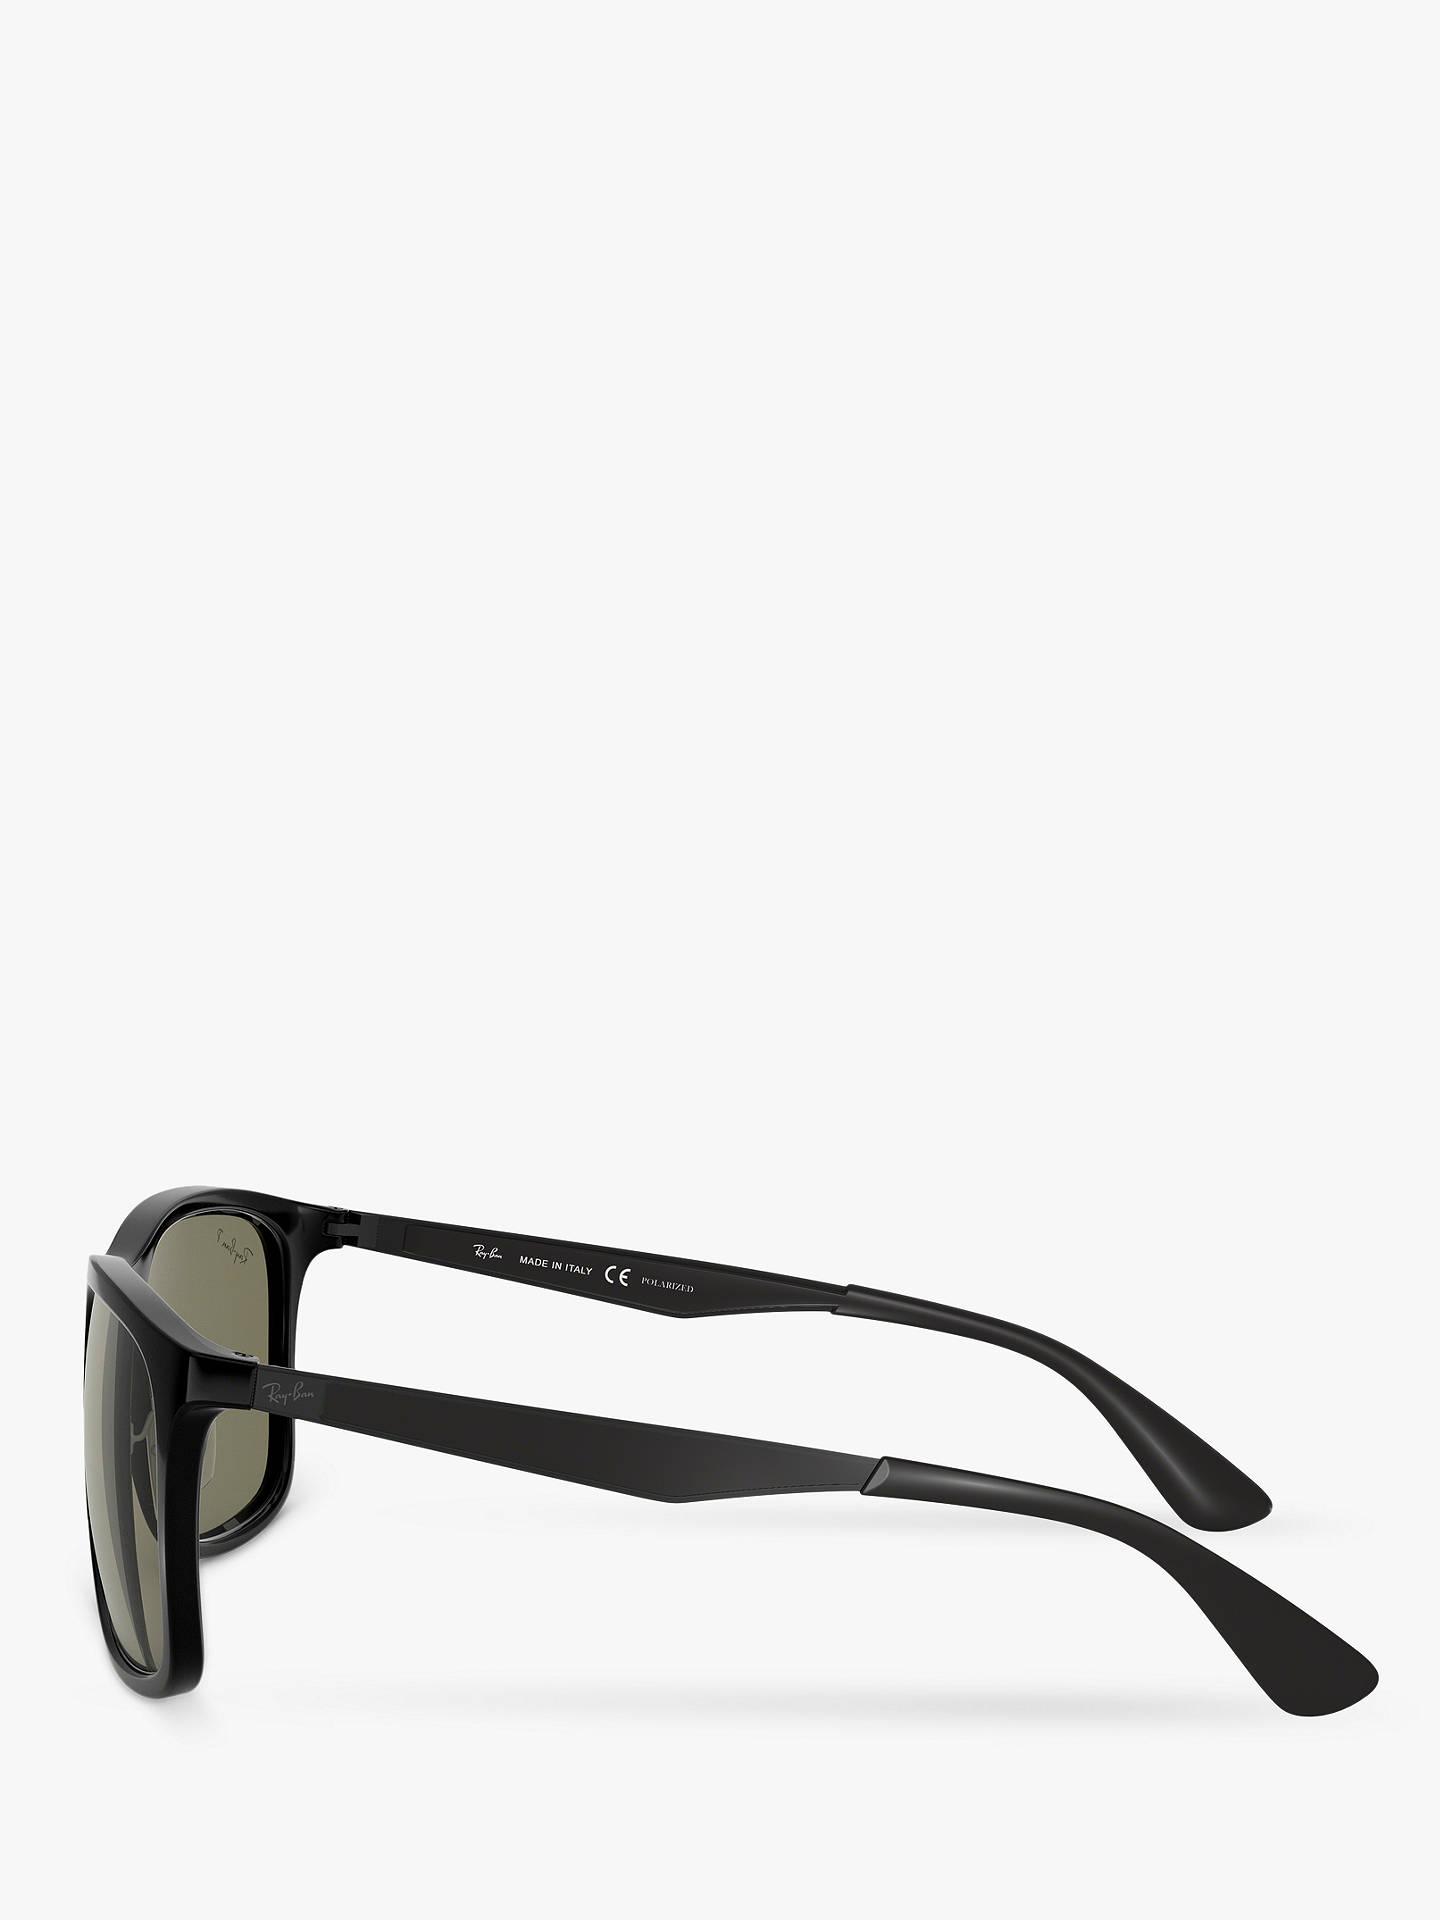 4fc2c579d8 BuyRay-Ban RB4340 Wayfarer Men s Sunglasses